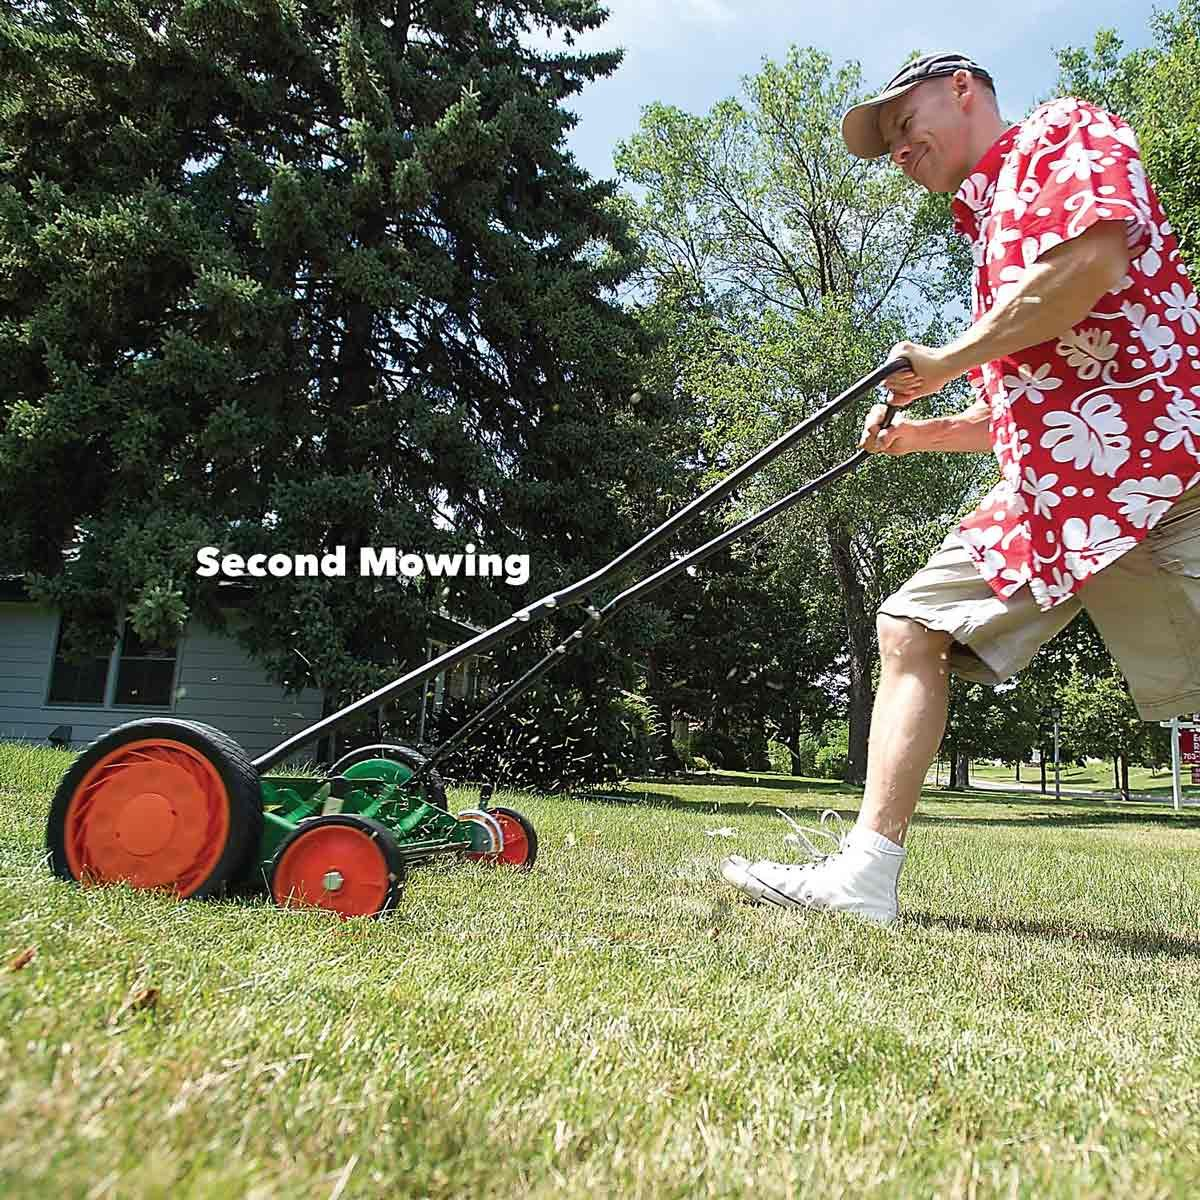 Man doing lawn maintenance